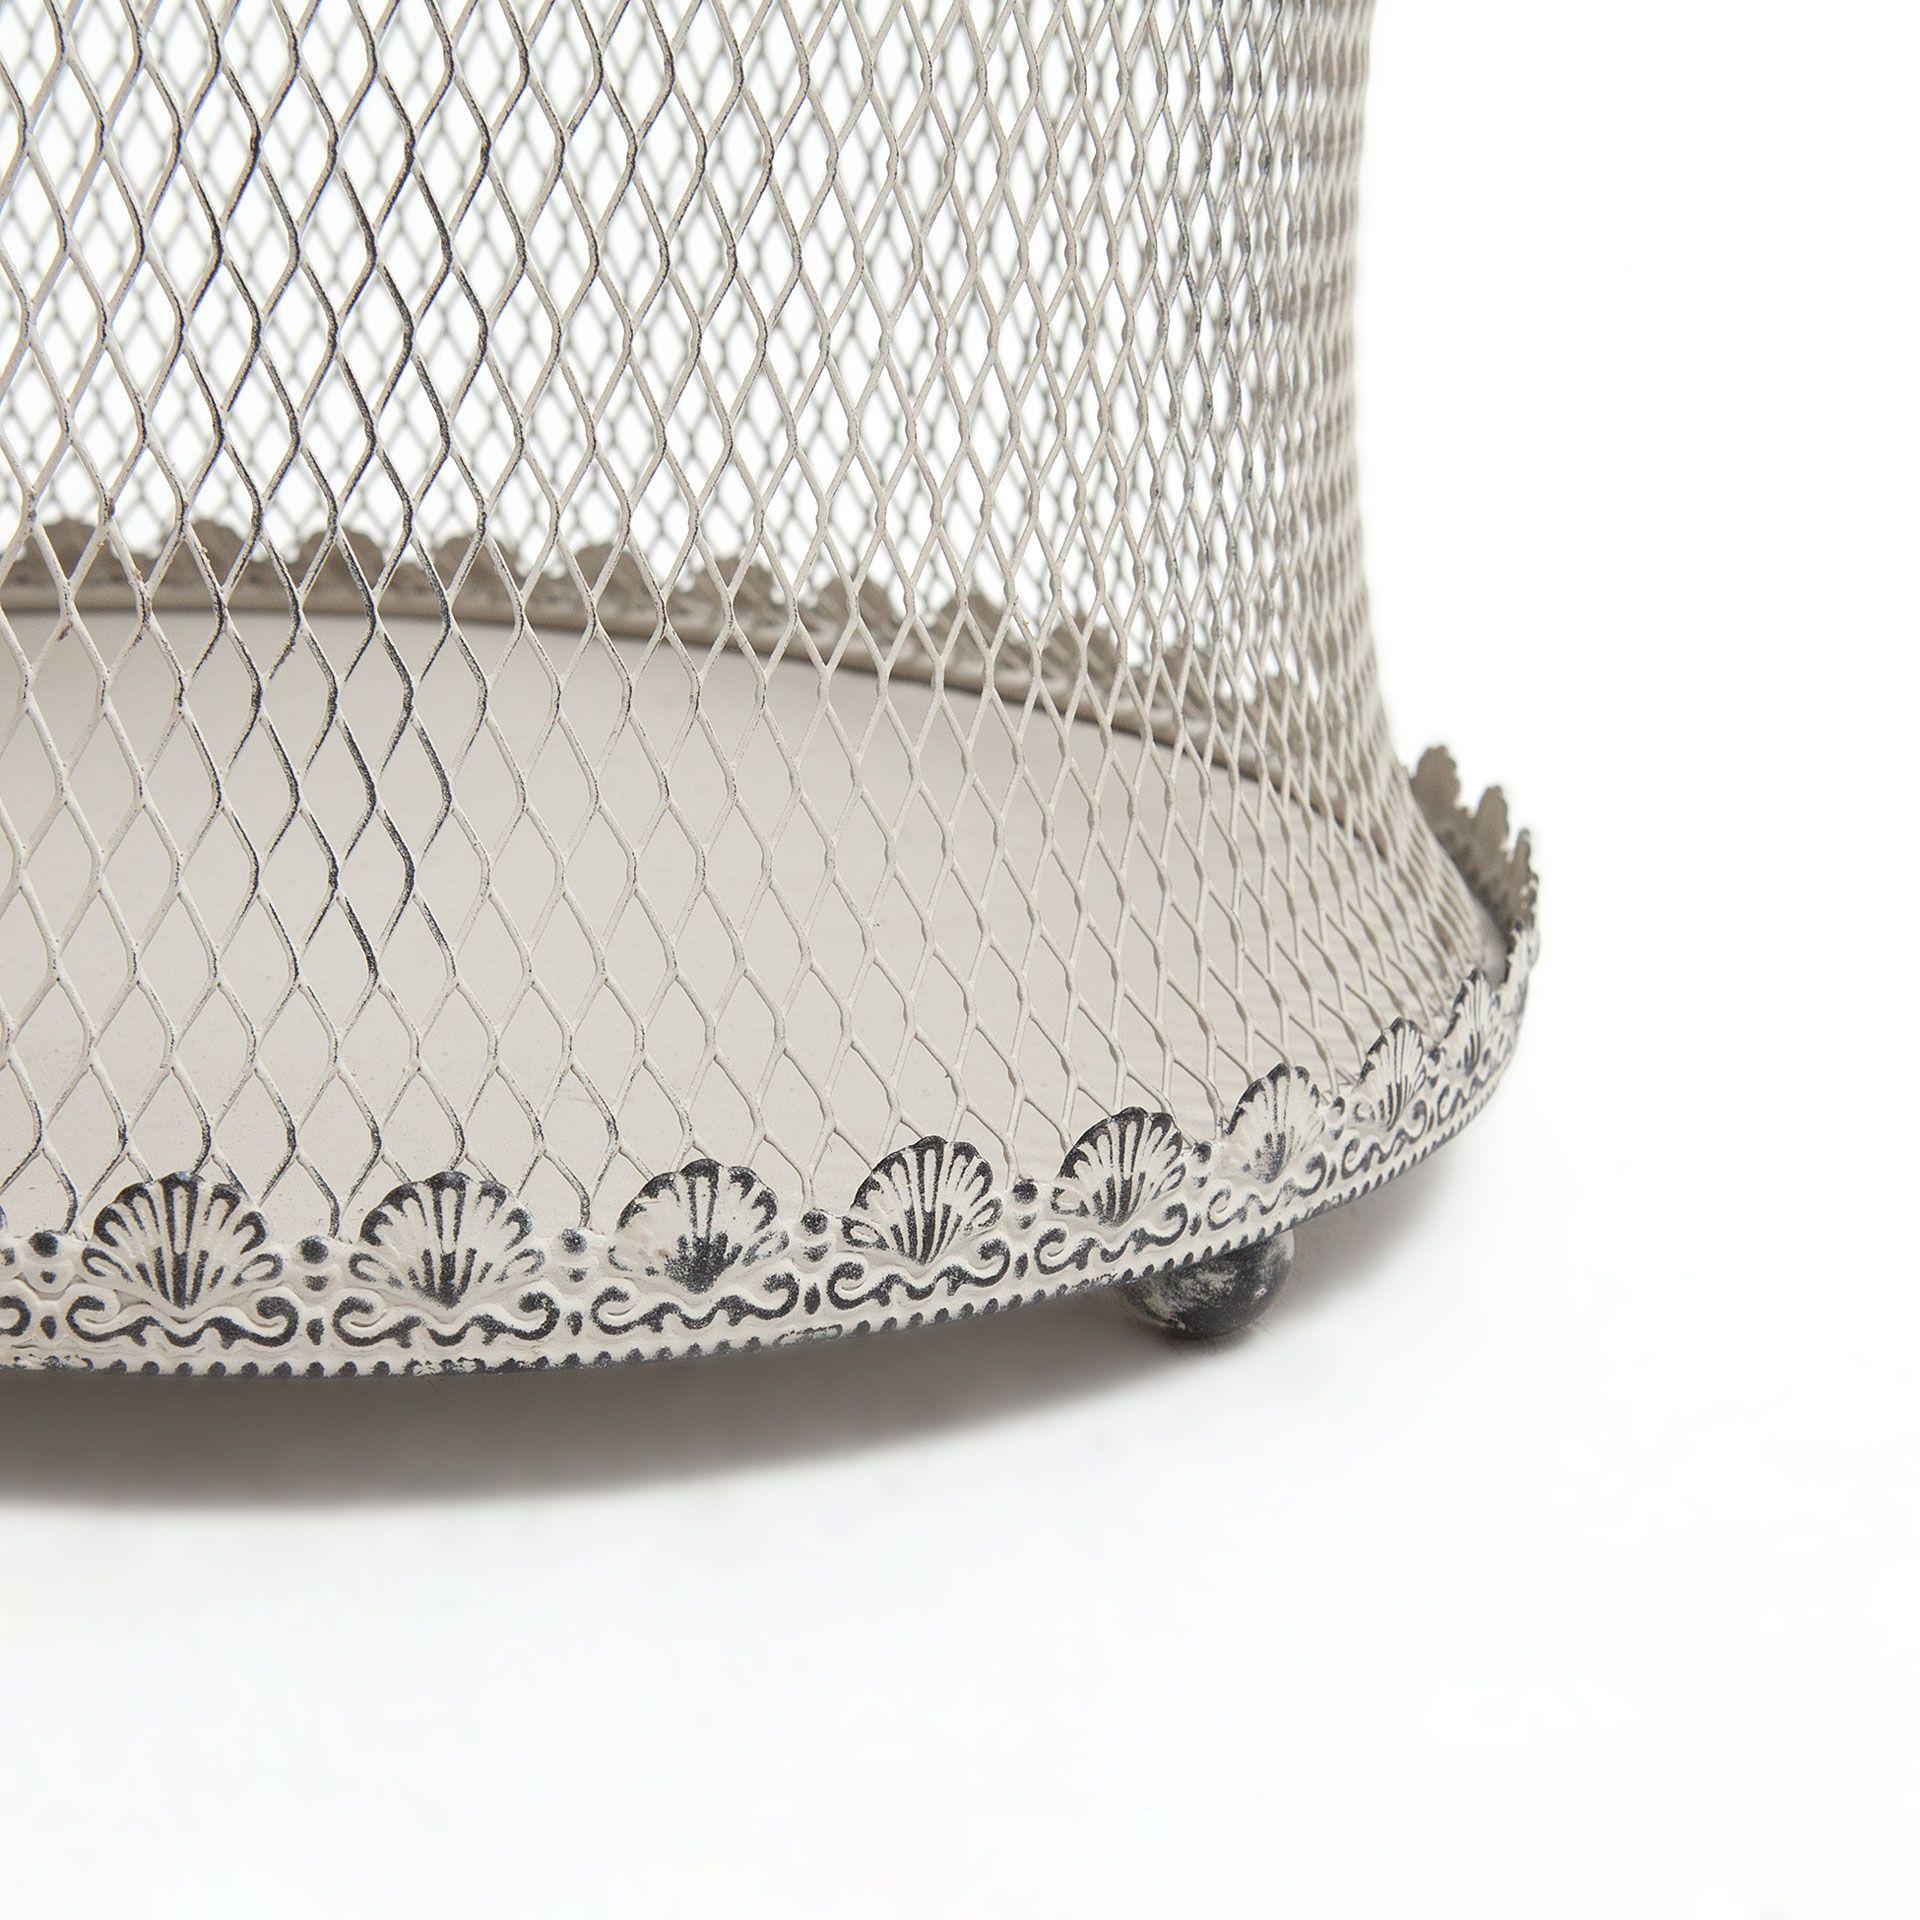 DECORATIVE BIRD CAGE - Decoration Accessories - Decoration | Zara Home Polska / Poland